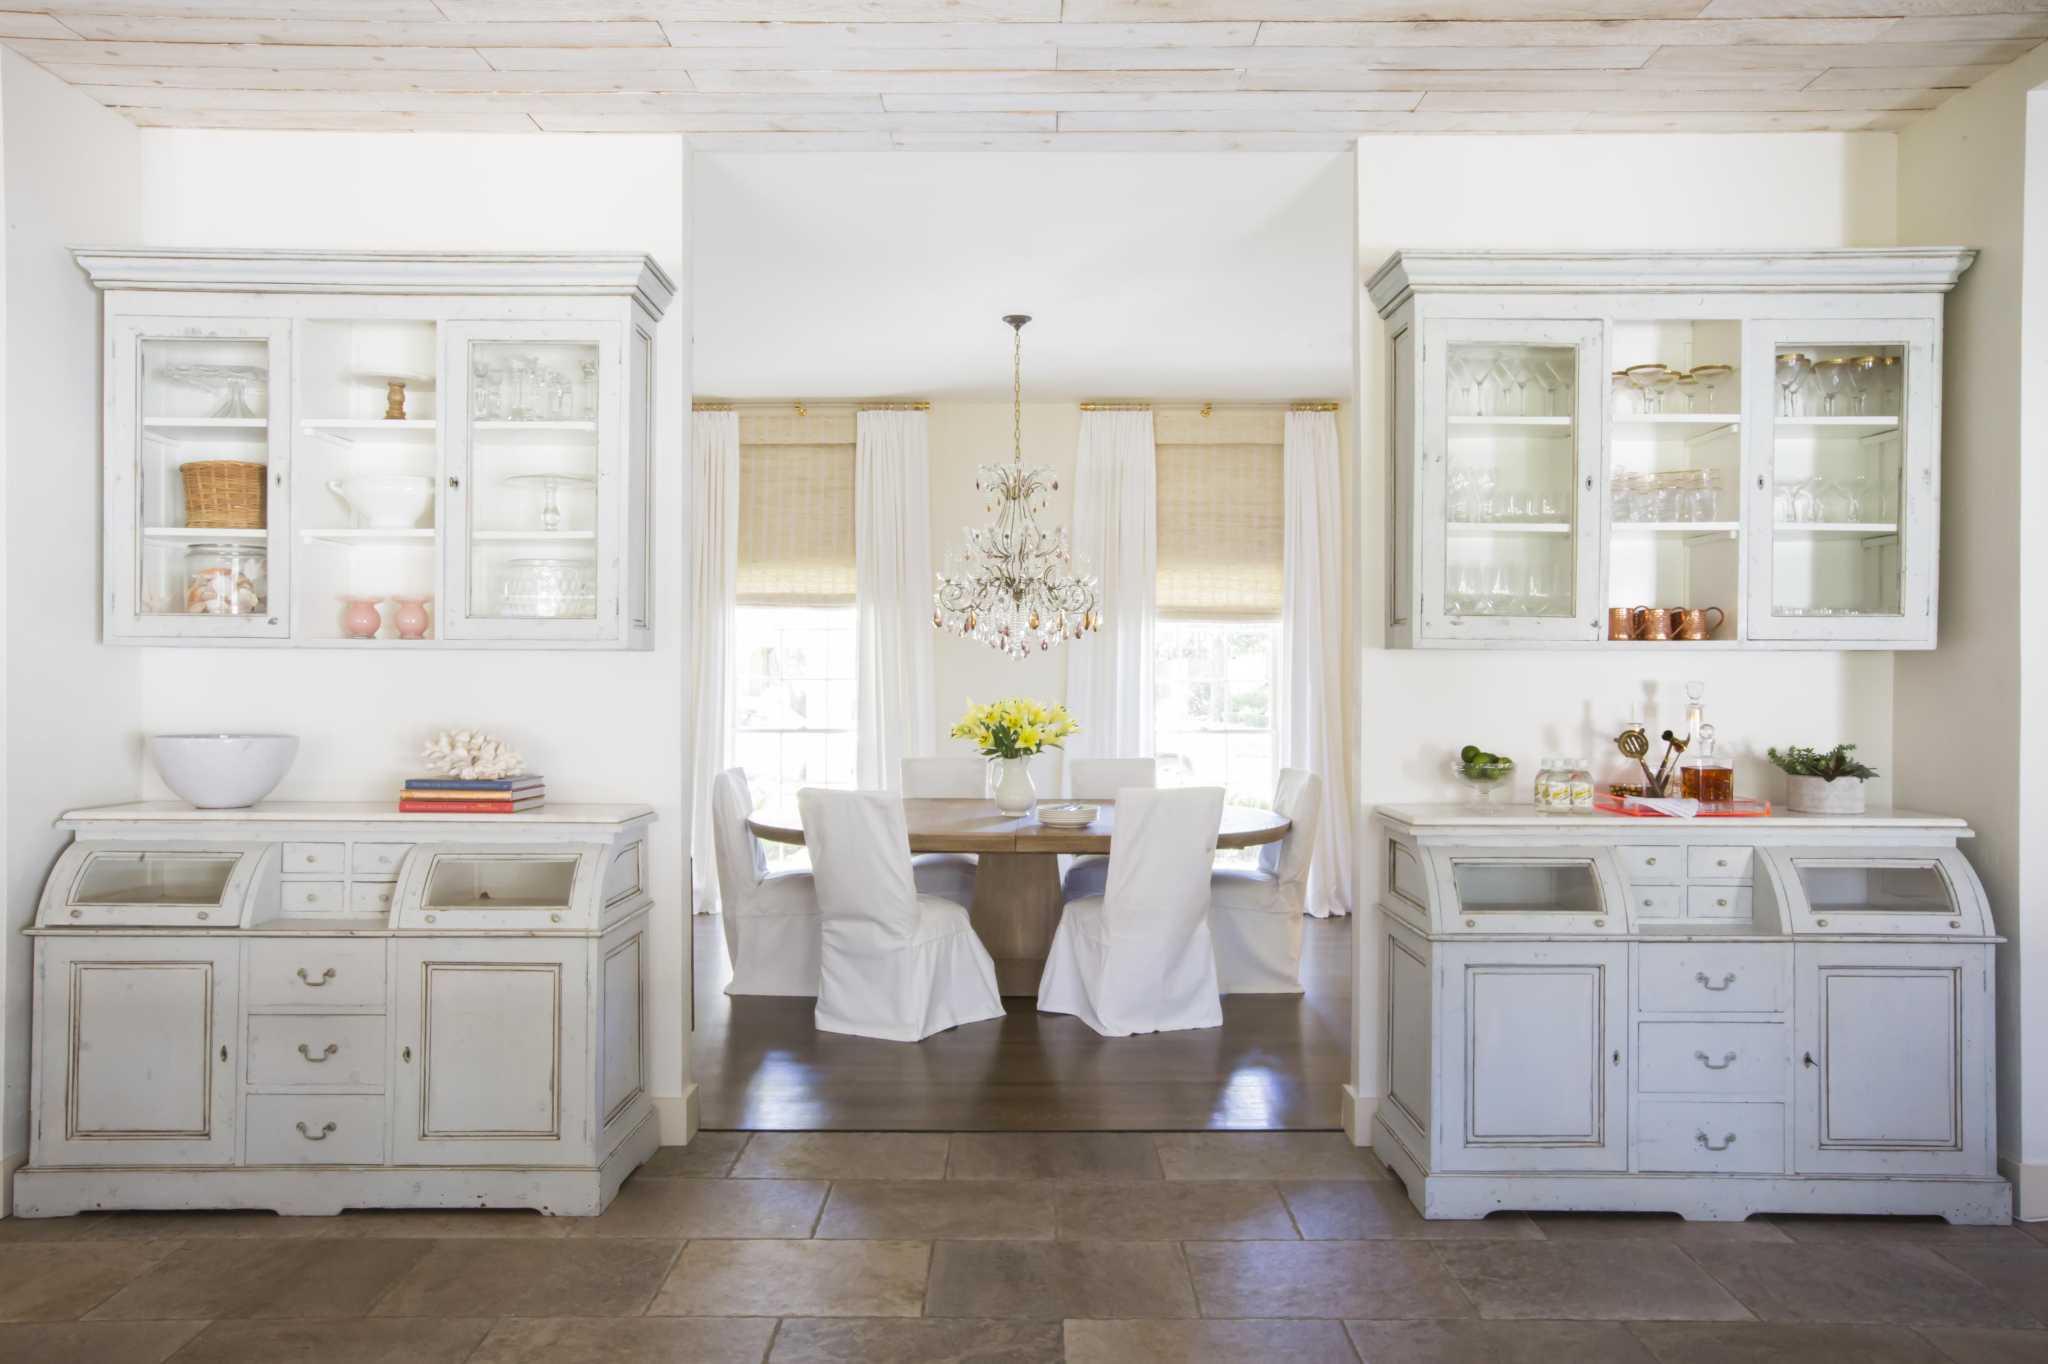 Designer Adds Happy Into Home Decor